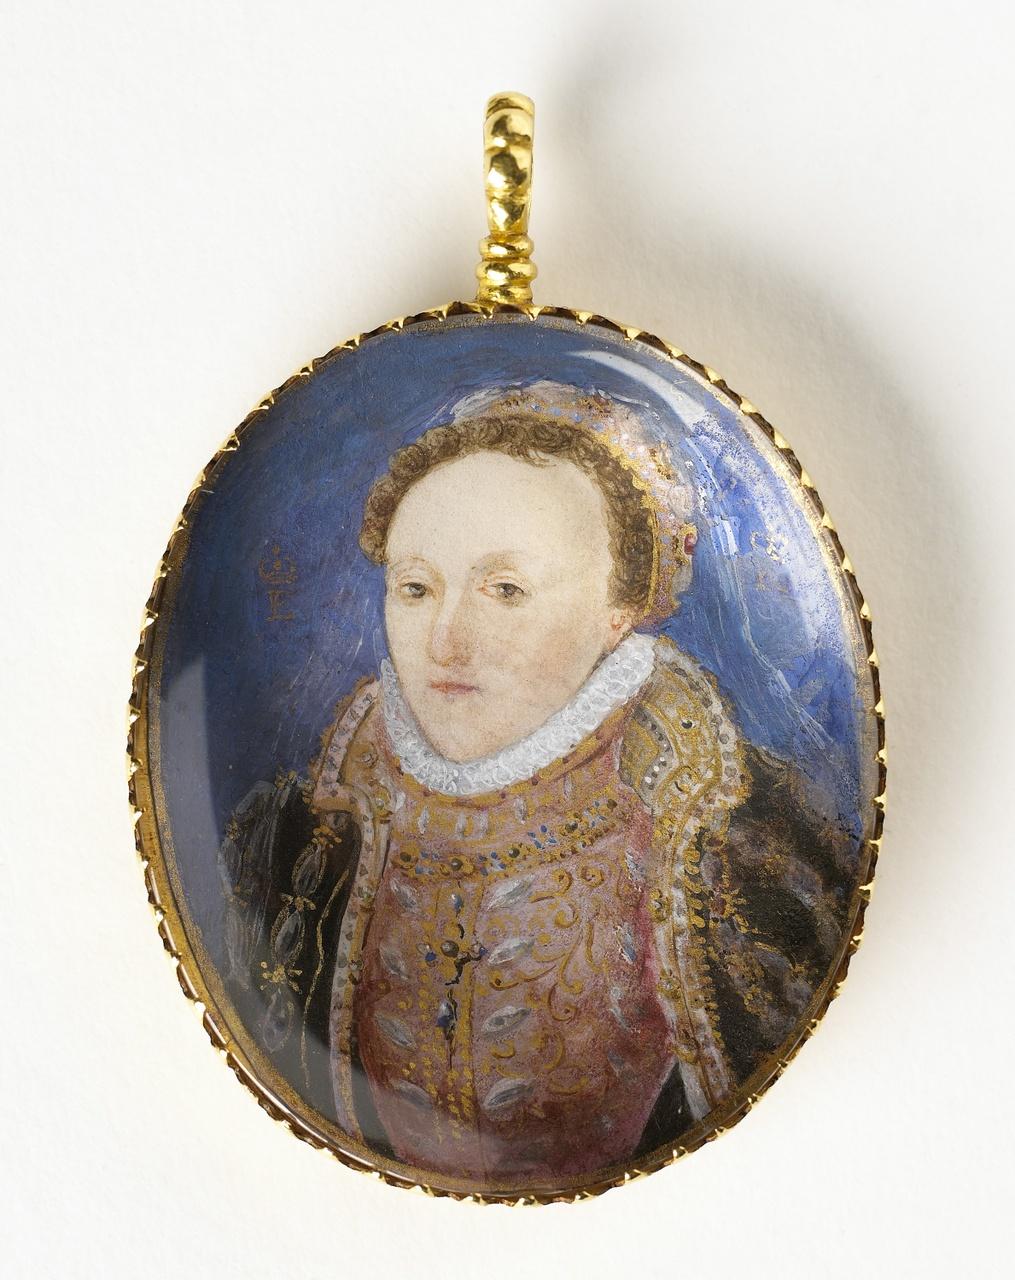 Medaillon met portret van koningin Elizabeth I van Engeland